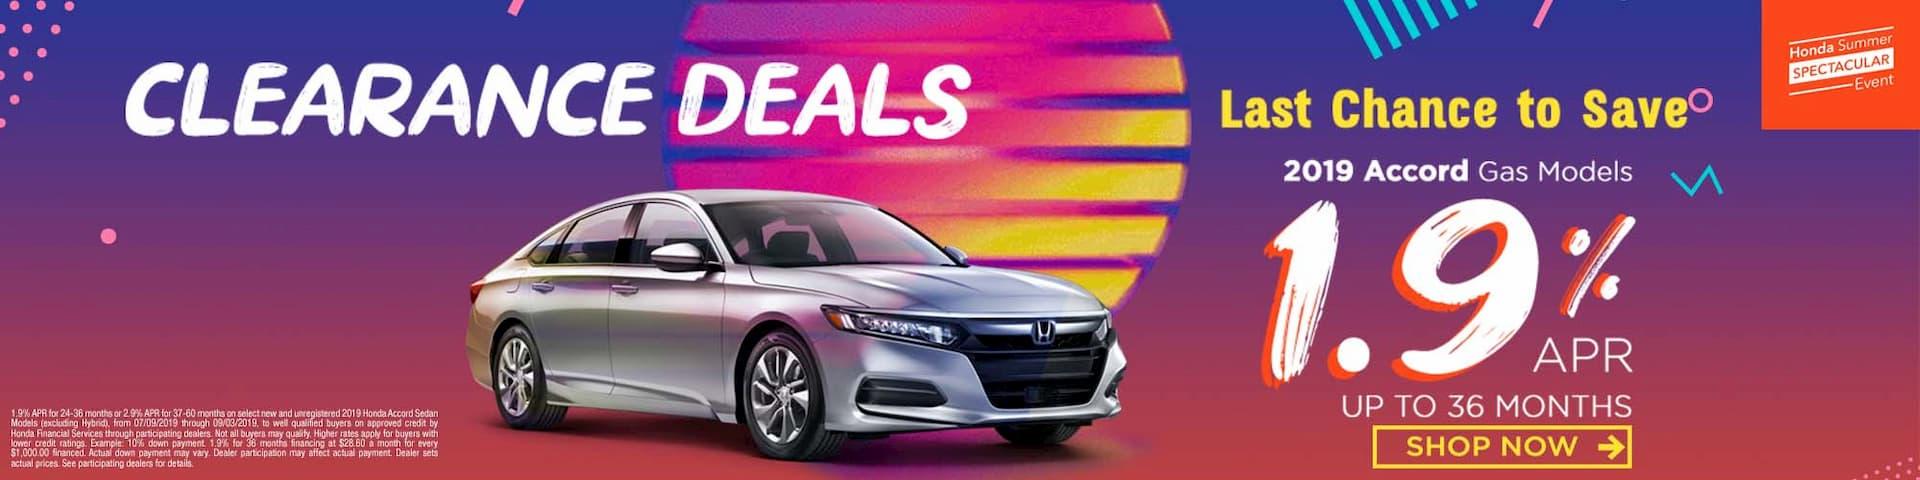 Honda Dealership Orange County >> Honda Dealership Car Dealers Coachella Valley Ca Unicars Honda